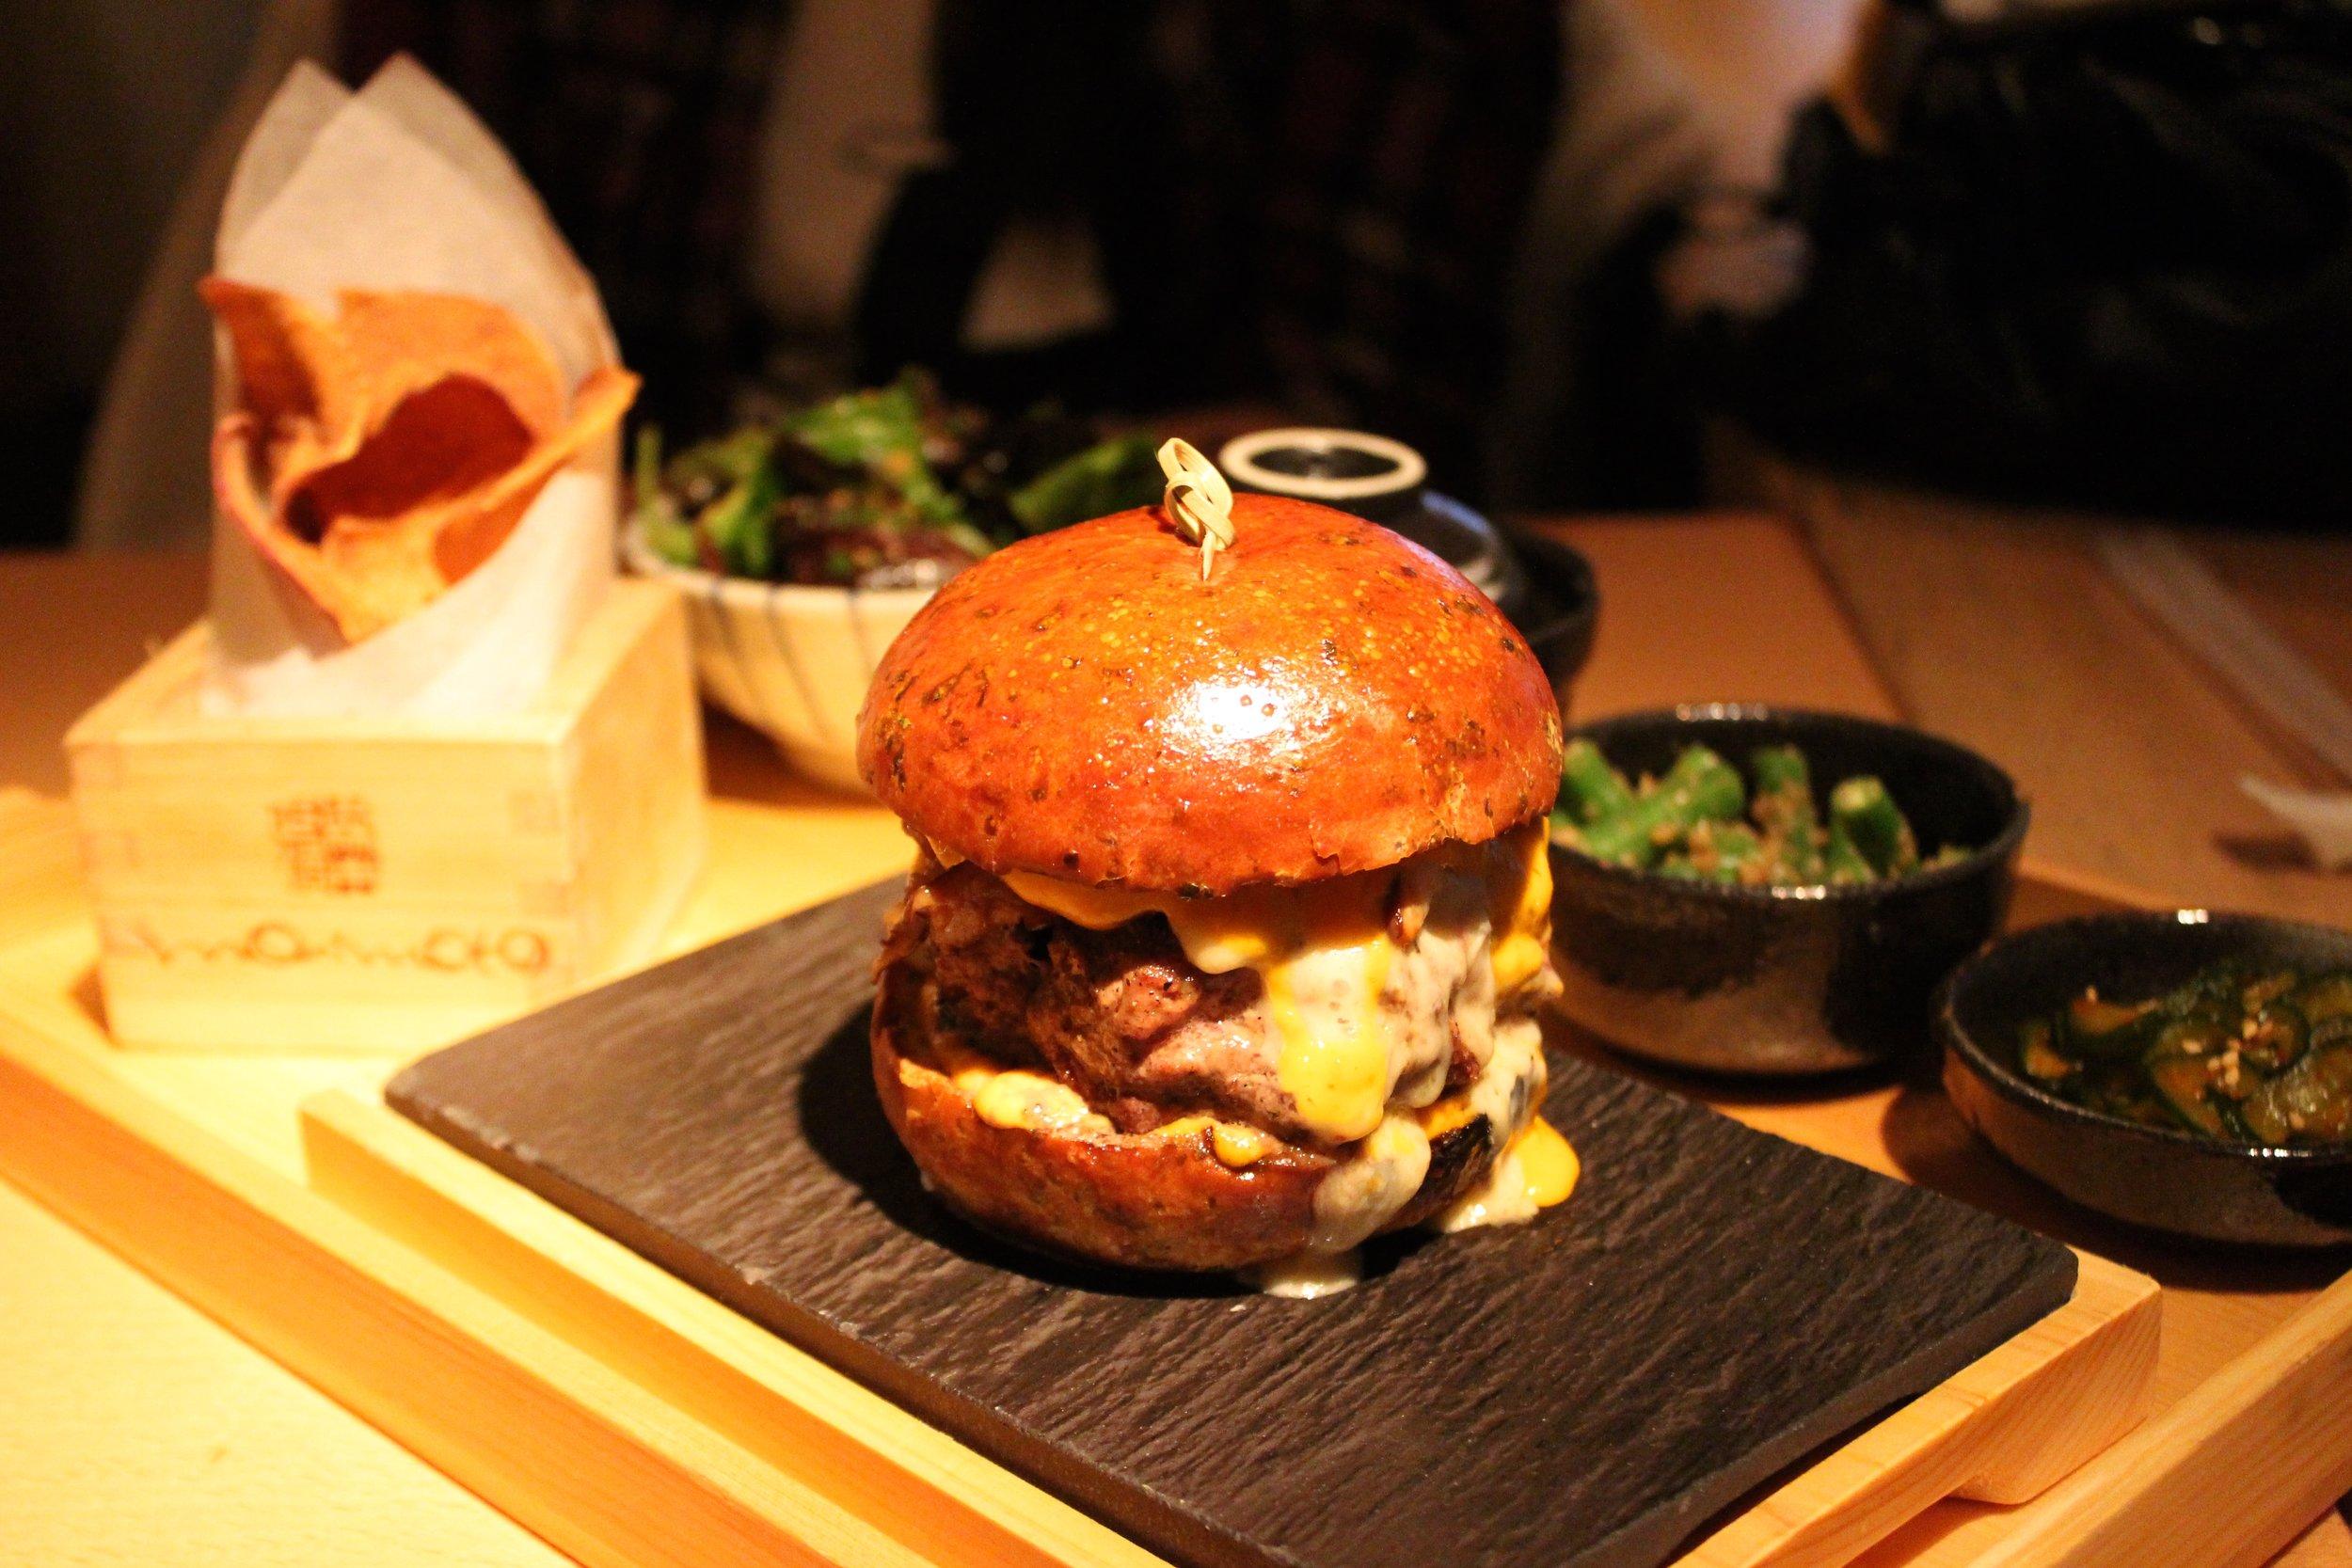 Morimoto dry aged burger at Morimoto